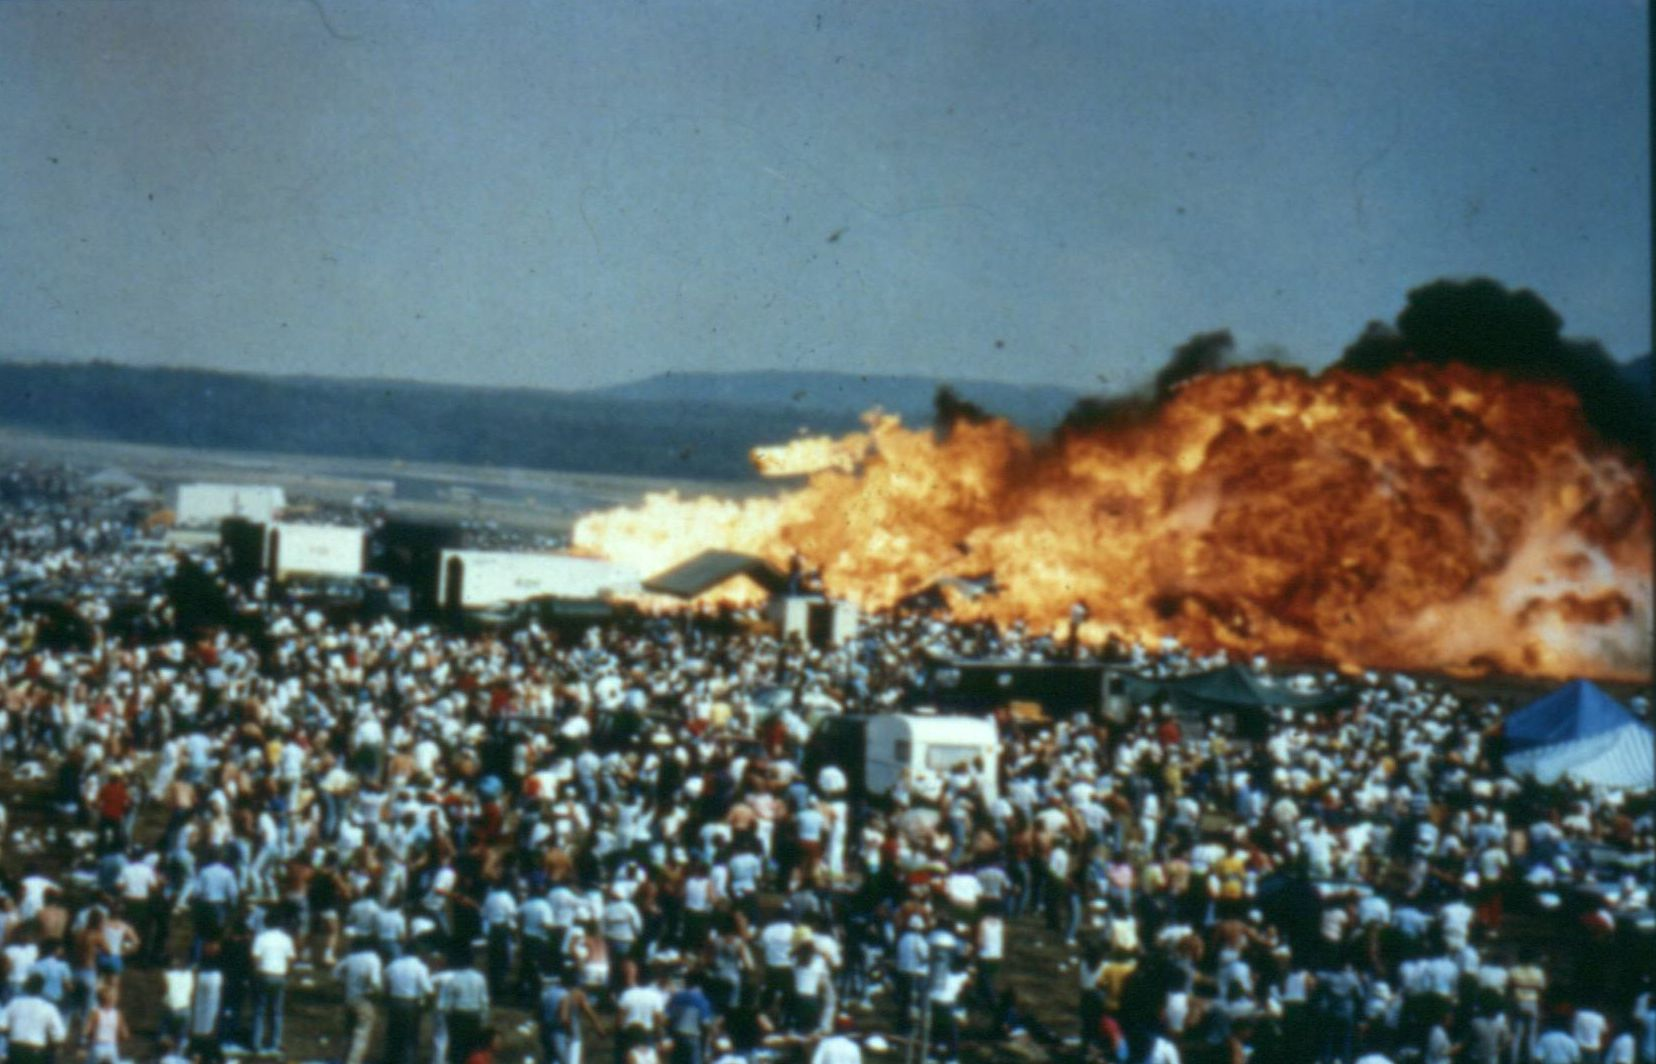 Základna se ocitne v plamenech v pouhých sedmi vteřinách.